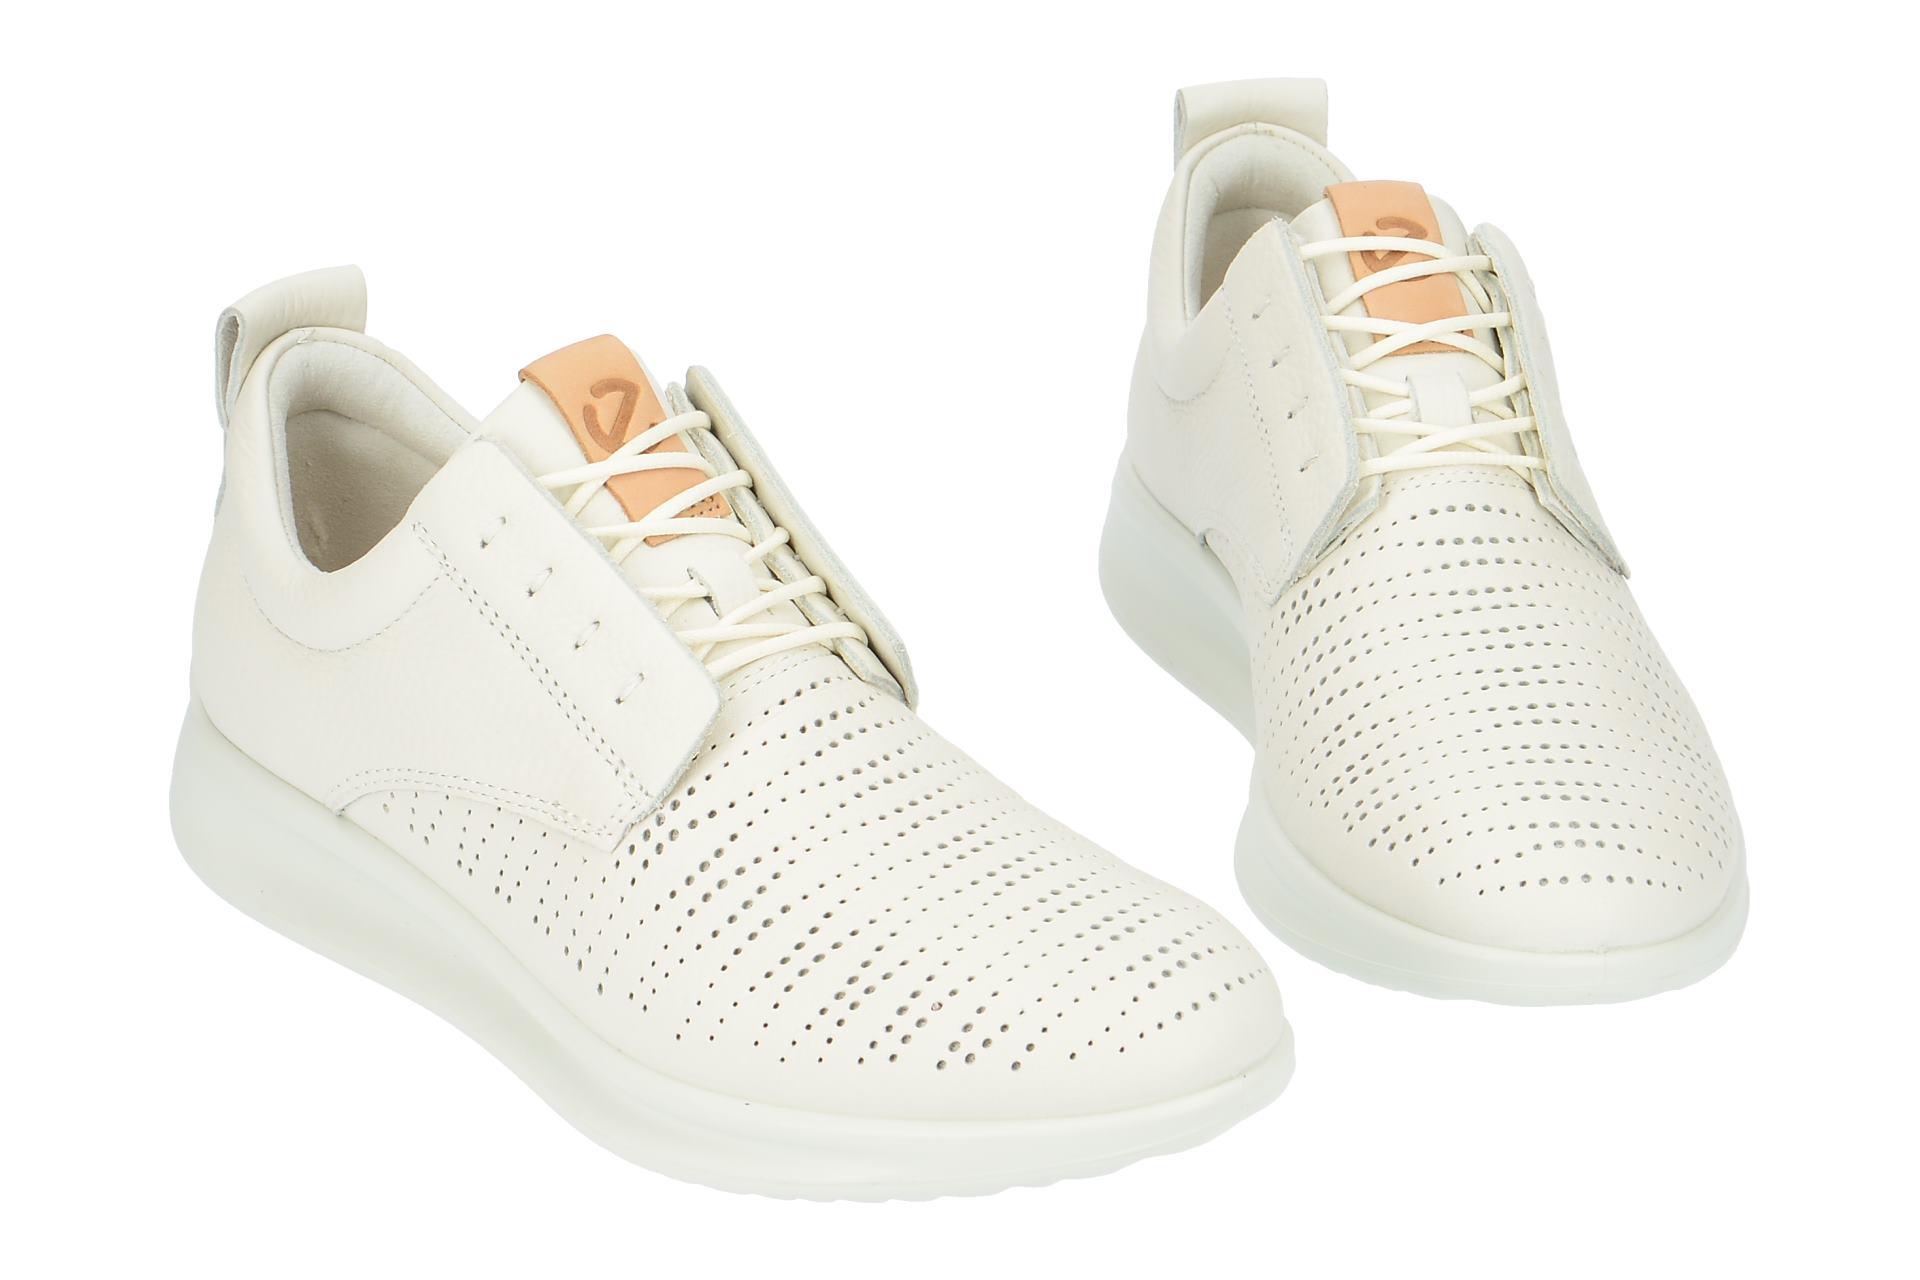 49256ab902b3bc Ecco Schuhe AQUET weiß Damenschuhe sportliche Schnür-Halbschuhe 20700301007  NEU